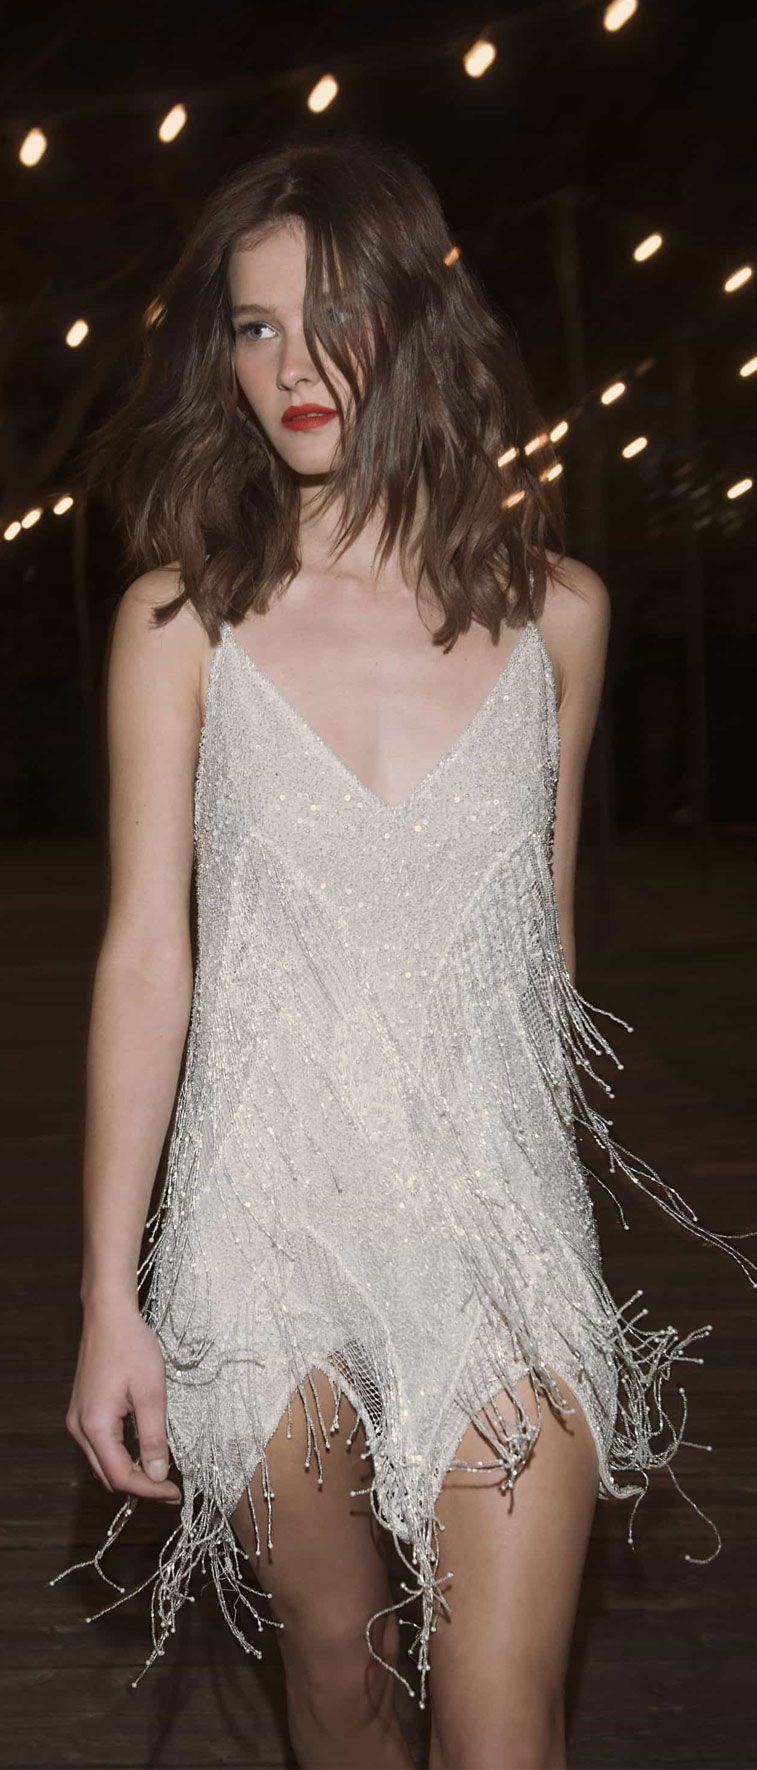 Eisen Stein Wedding Dresses – Bohemian Fest